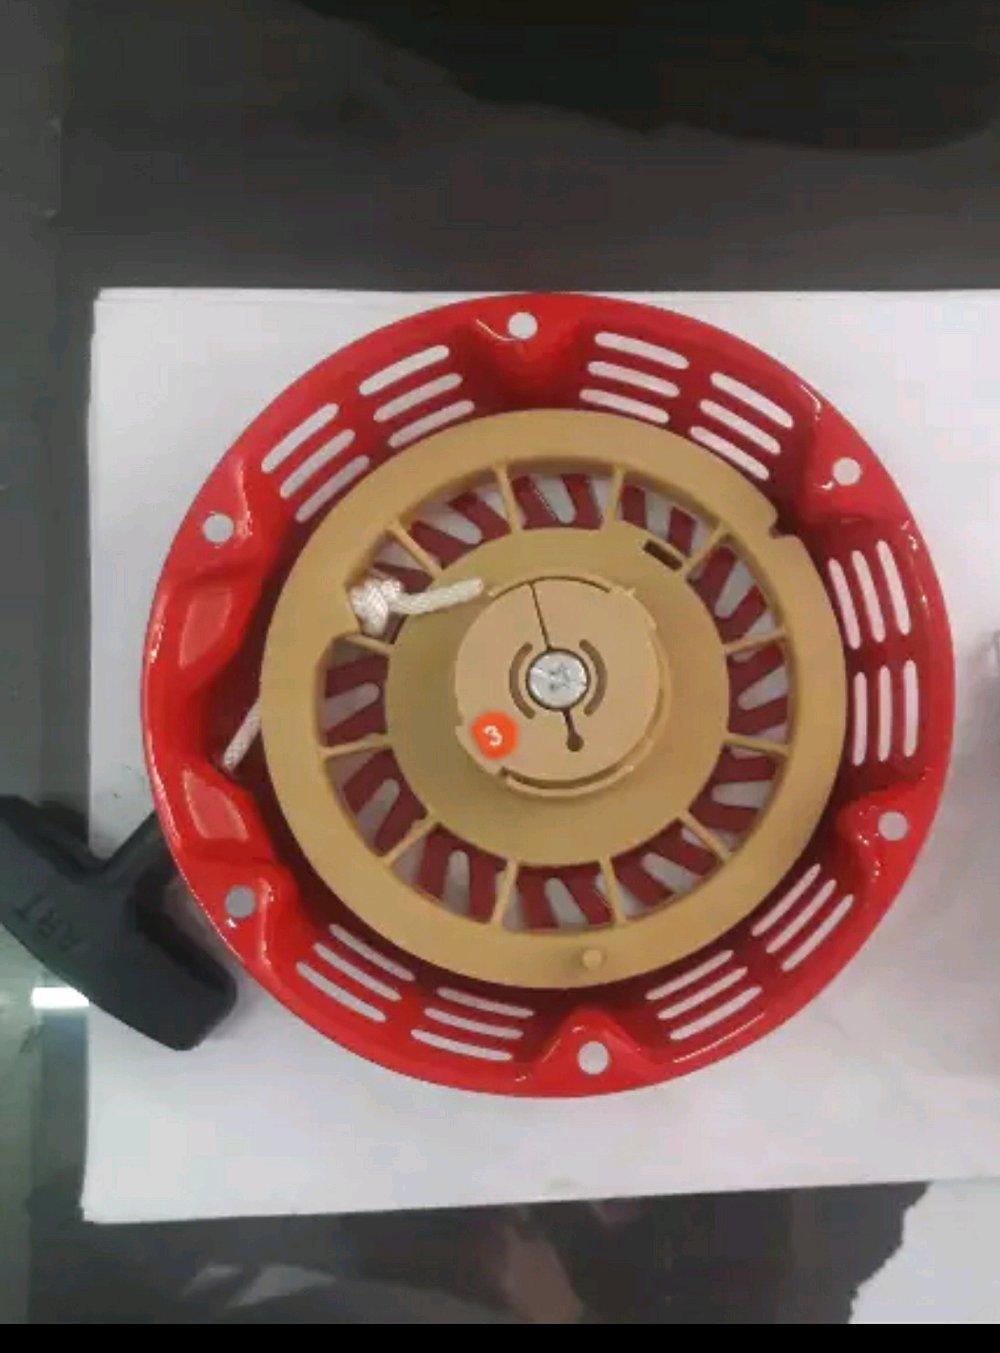 Kelebihan Ewo Iginition Coil Cdi Mesin Gx160 Gx200 Untuk Busi Potong Rumput Recoil Starter Penggerak Honda